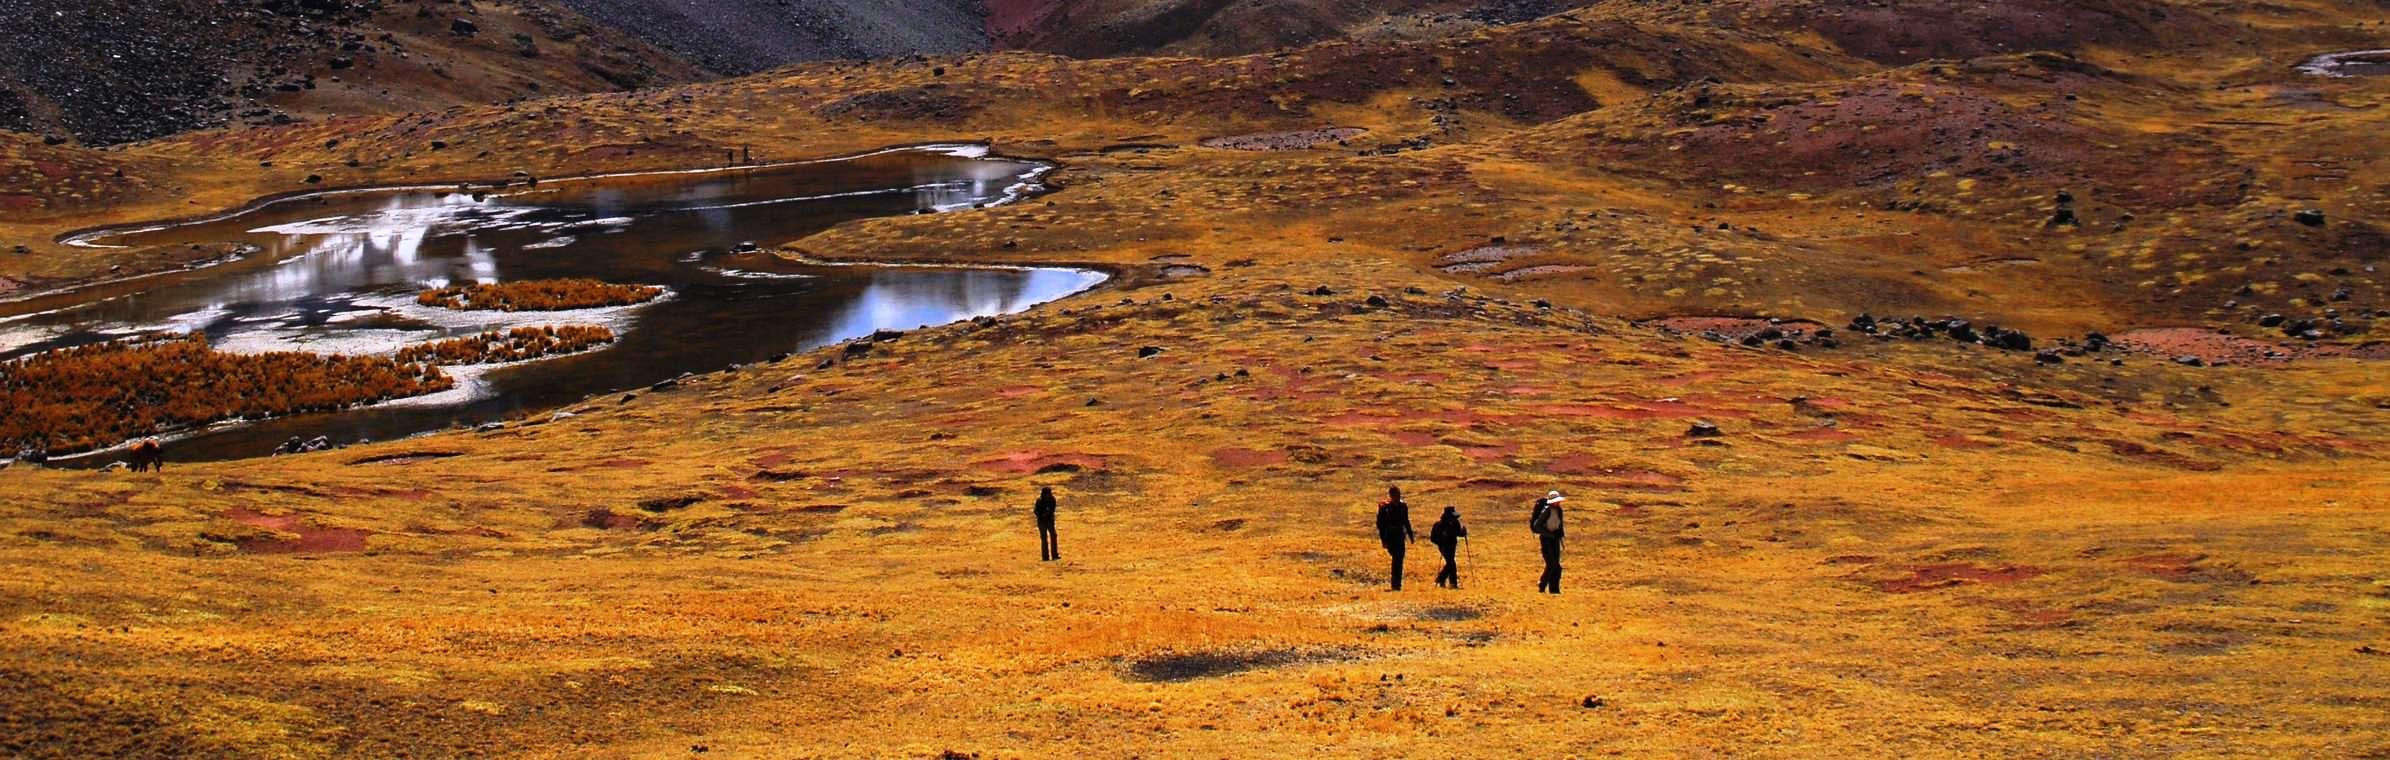 trekking in peru yanapanakusun peruresponsabile cusco valle sagrado (7).jpg